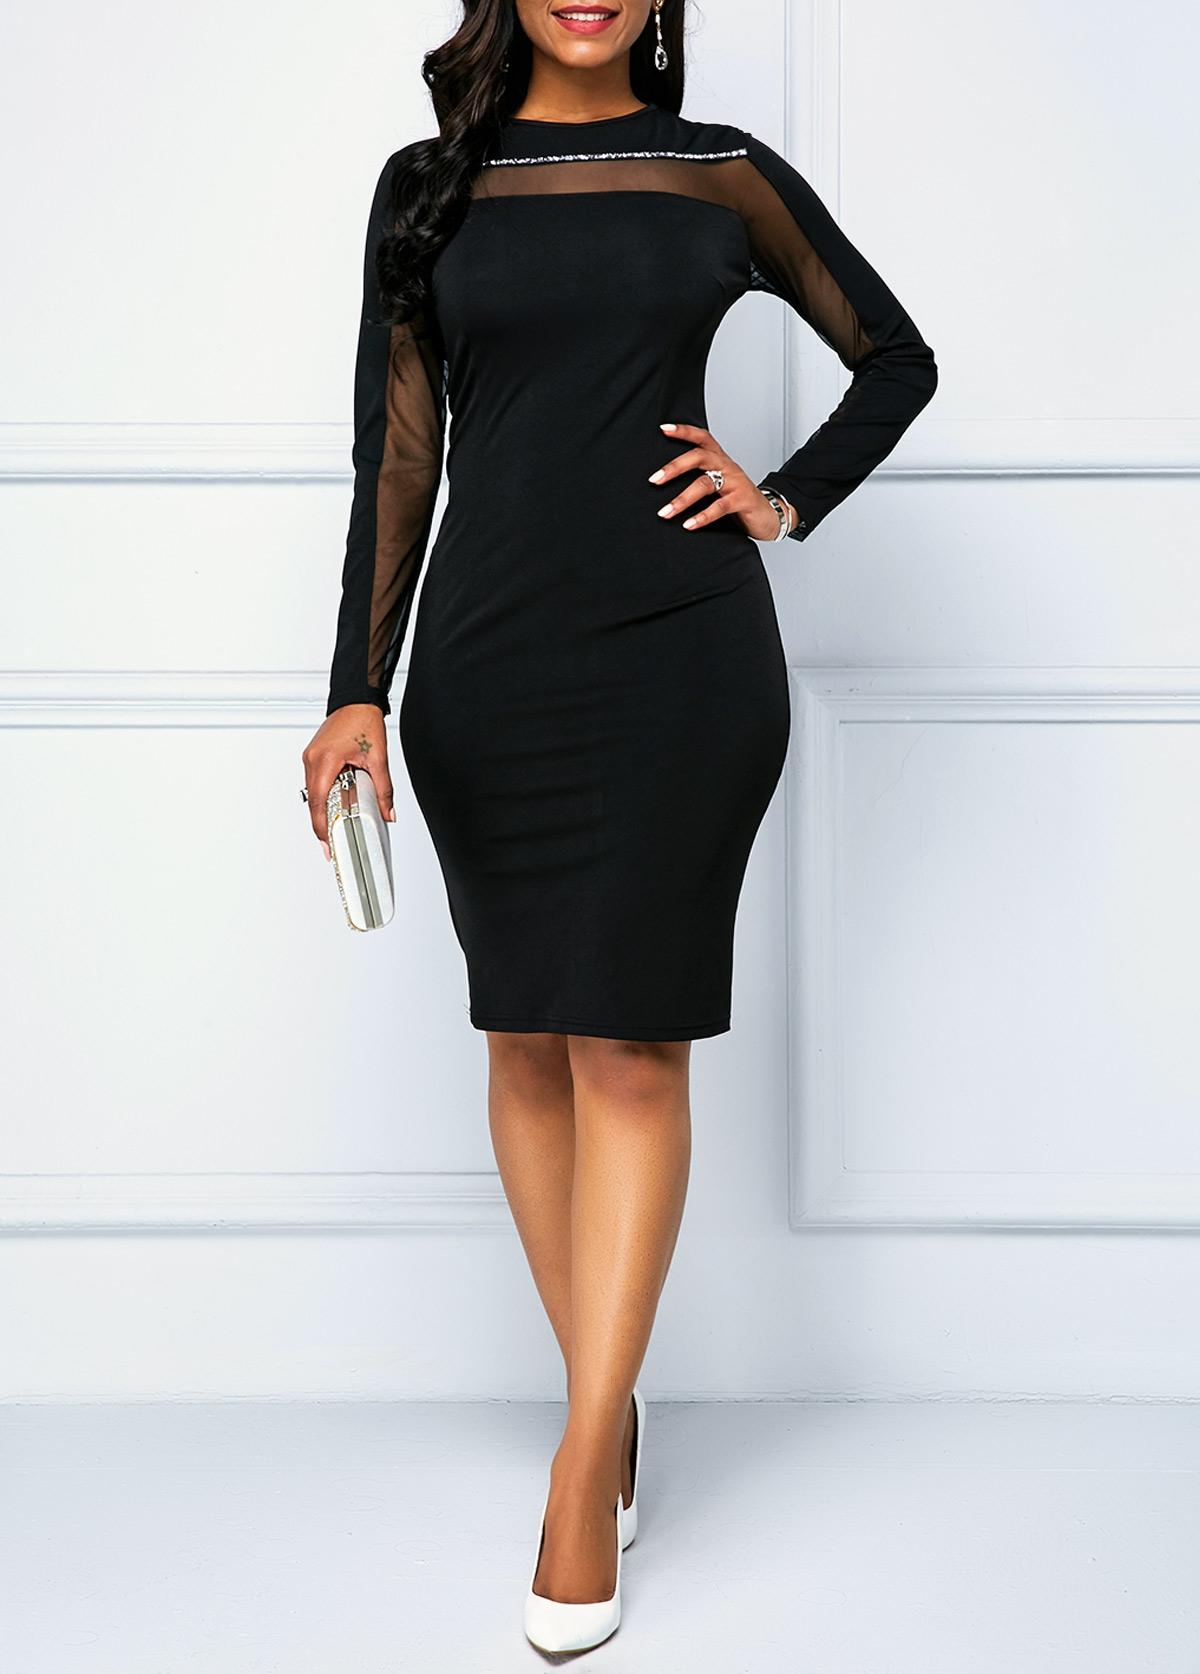 Black Zipper Back Long Sleeve Sheath Dress